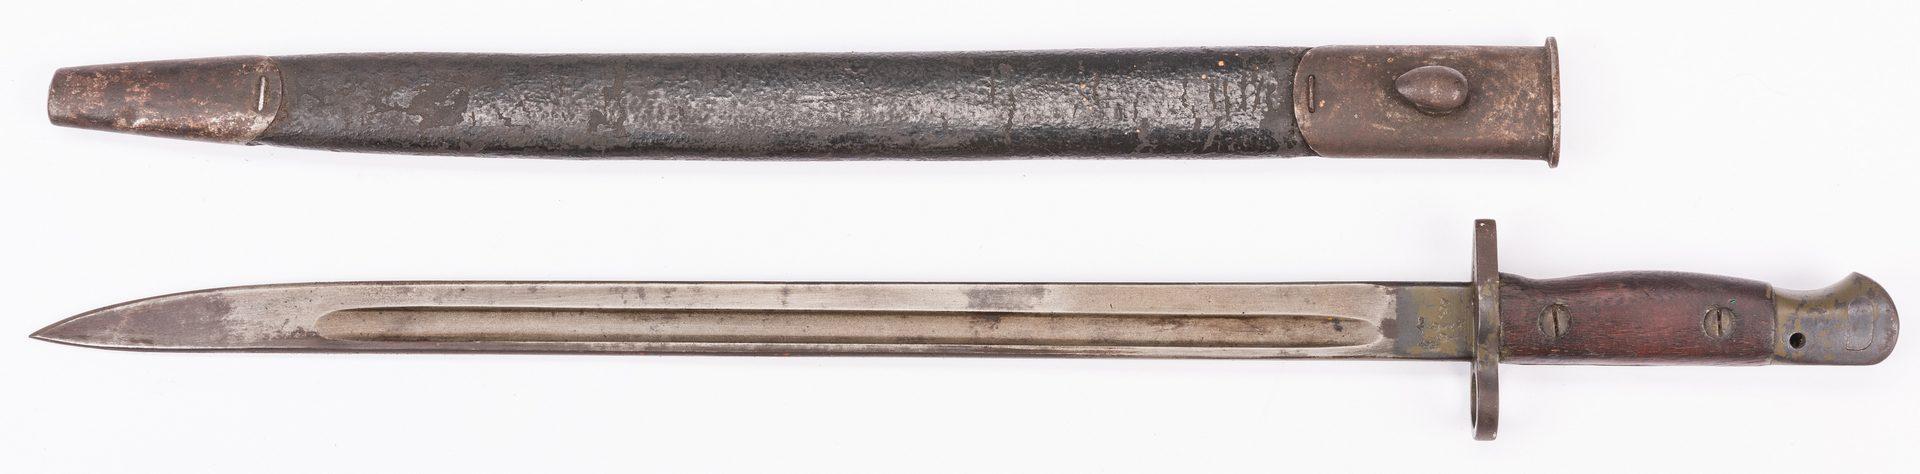 Lot 794: Springfield Model 1873 rifle, bayonet, & holster, 3 items